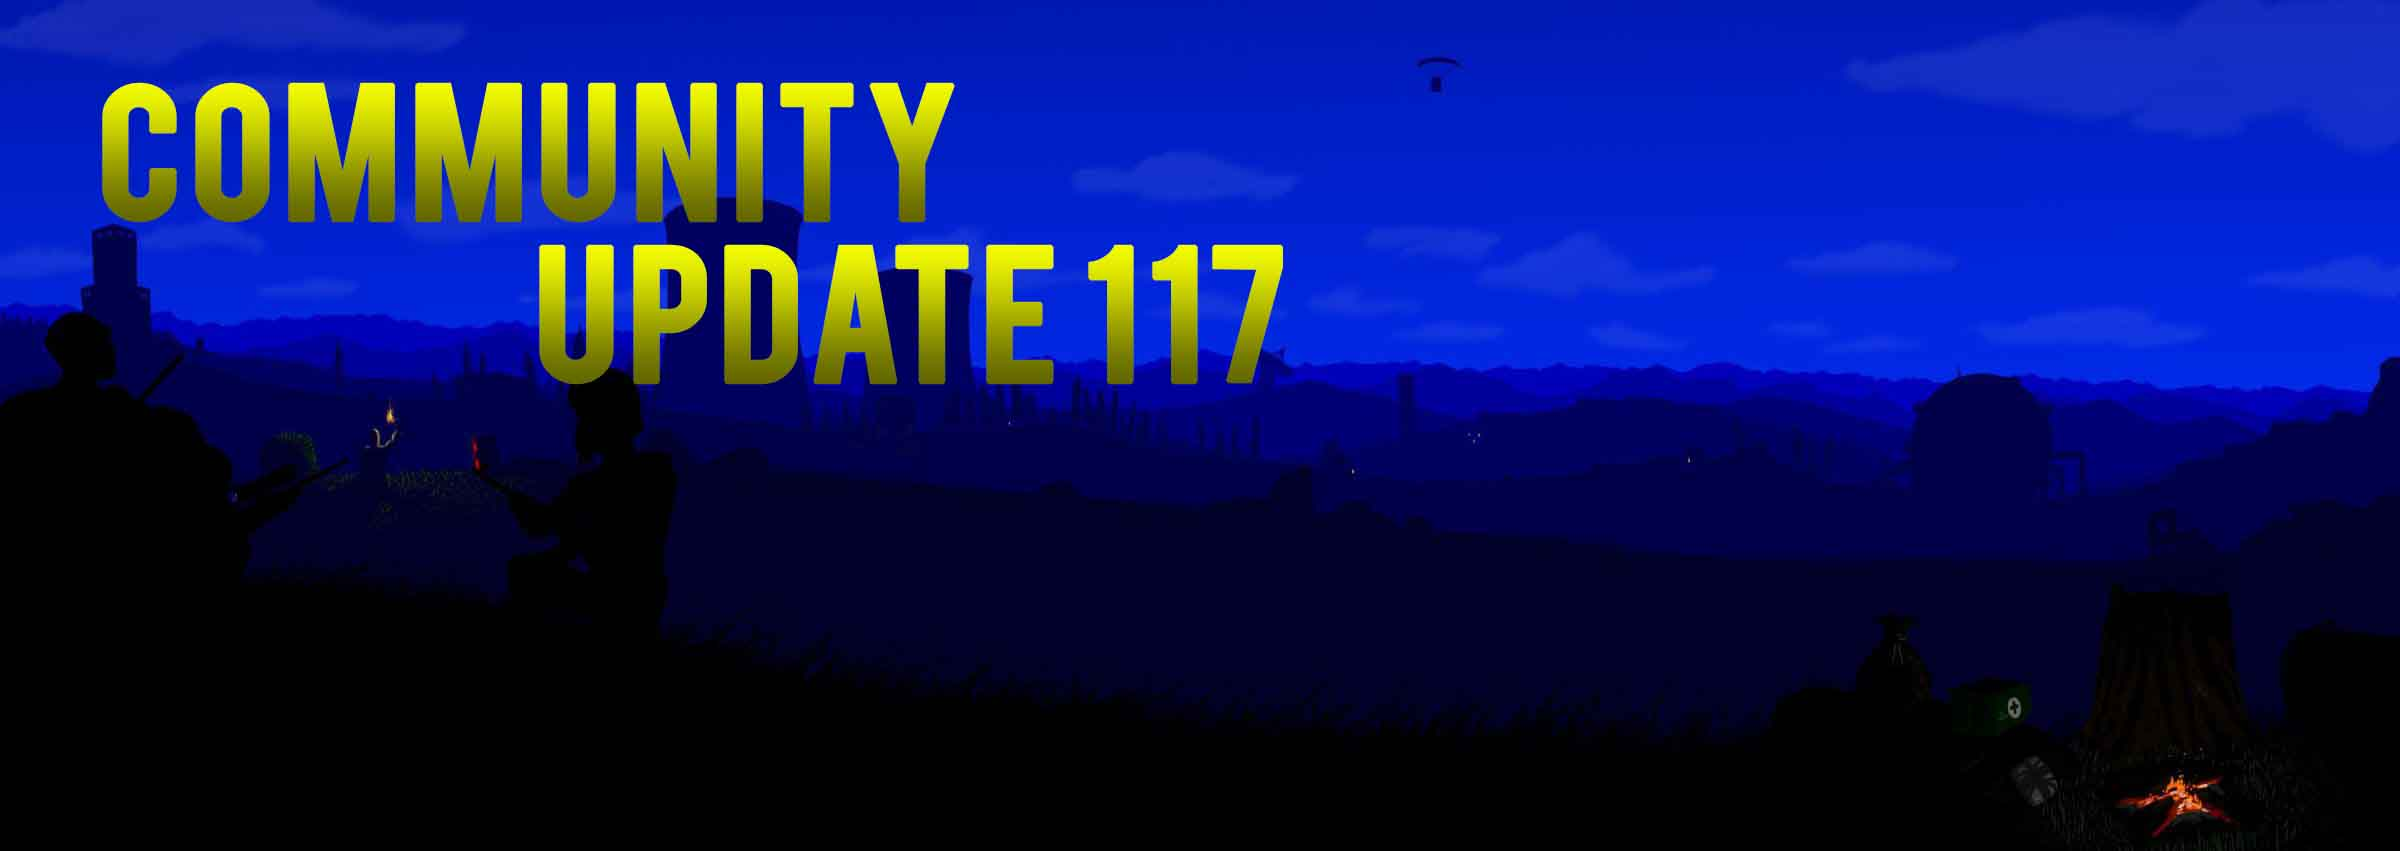 Community Update 117